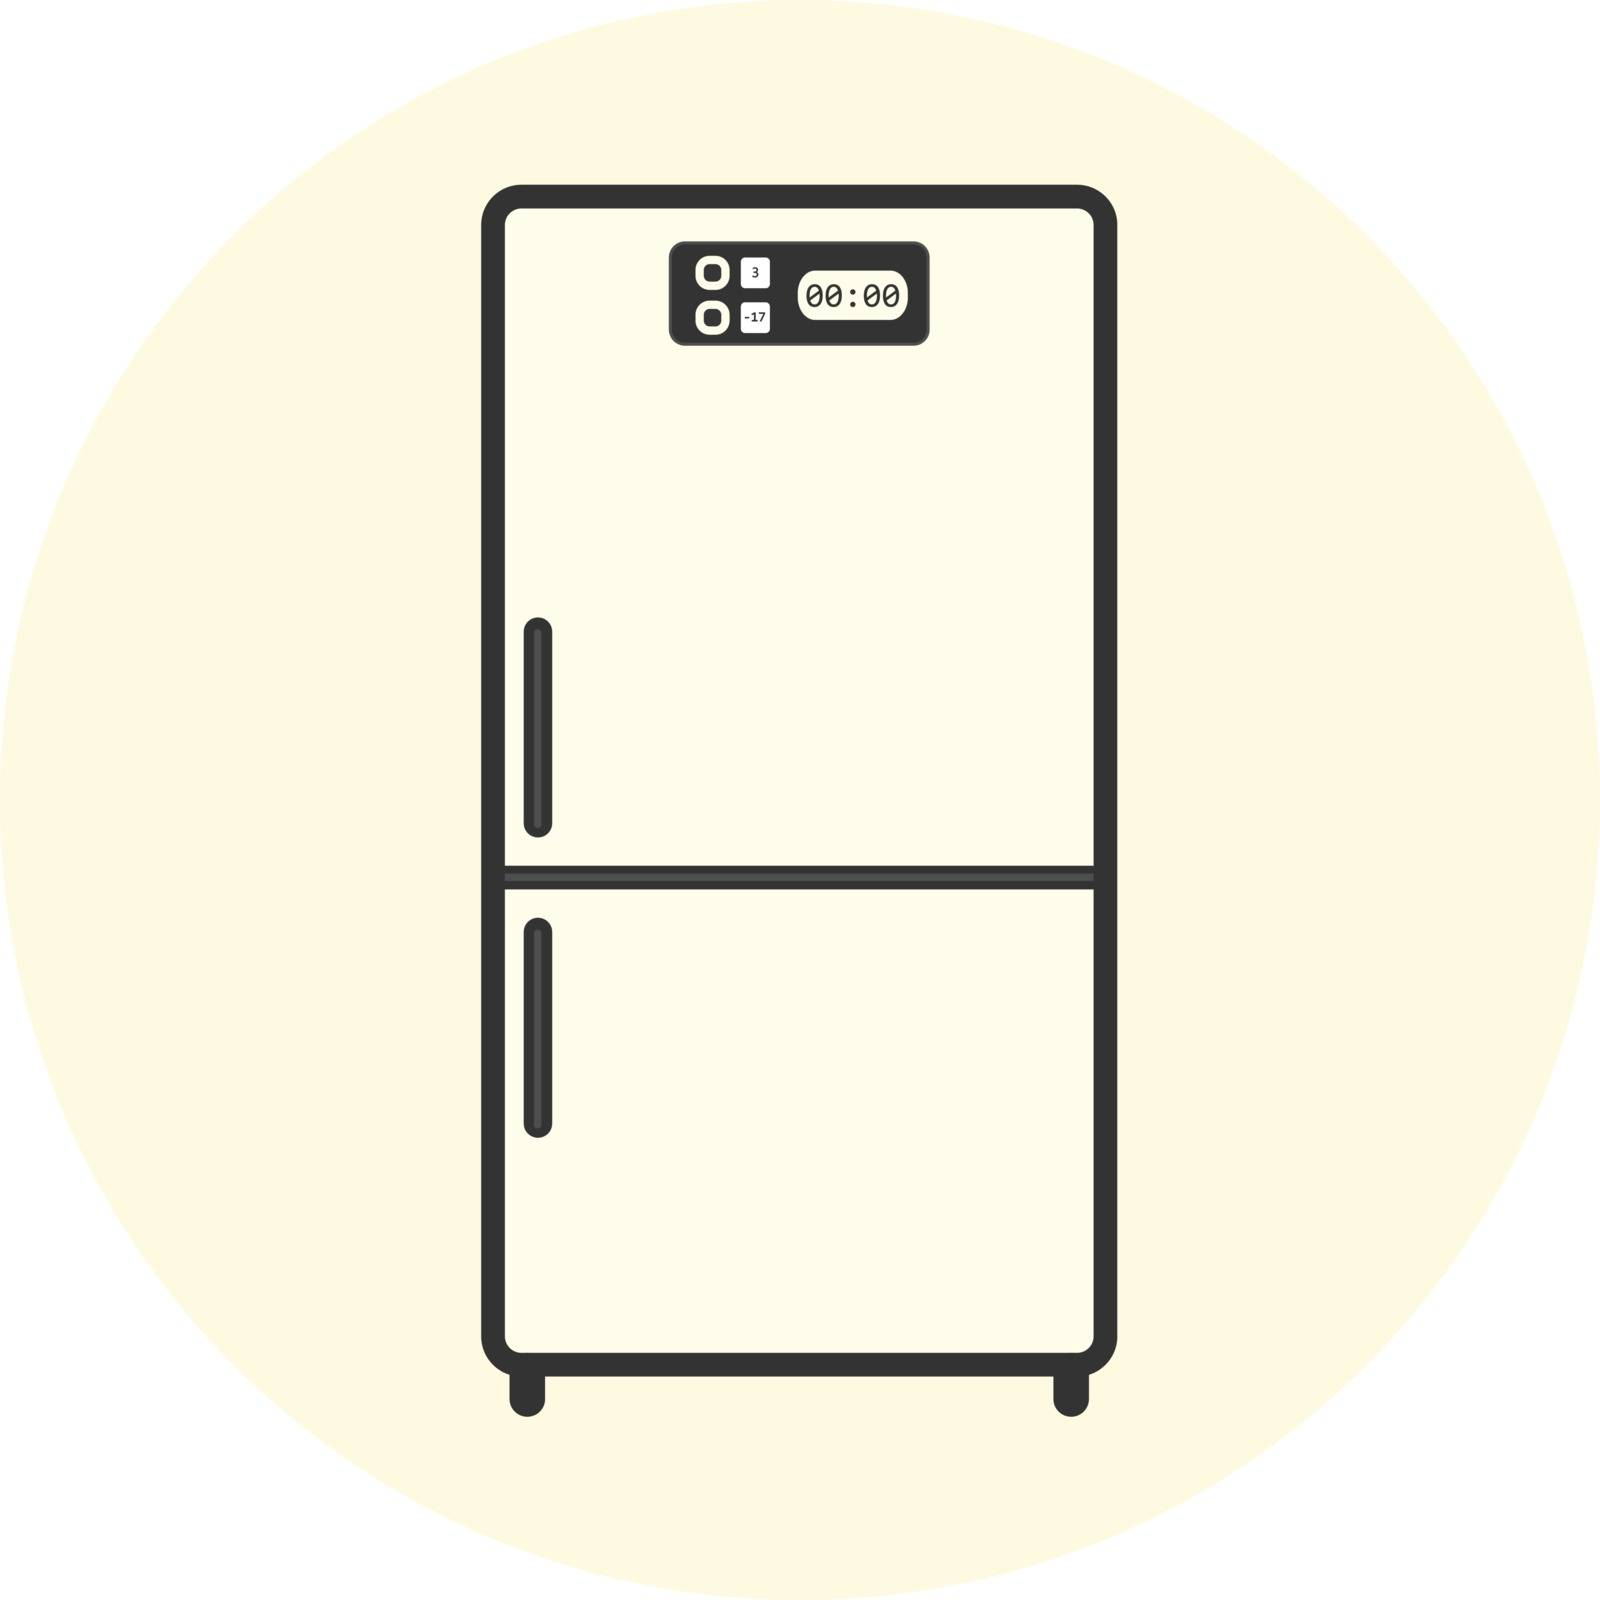 Flat white refrigerator icon, appliance vector symbol, kitchen equipment